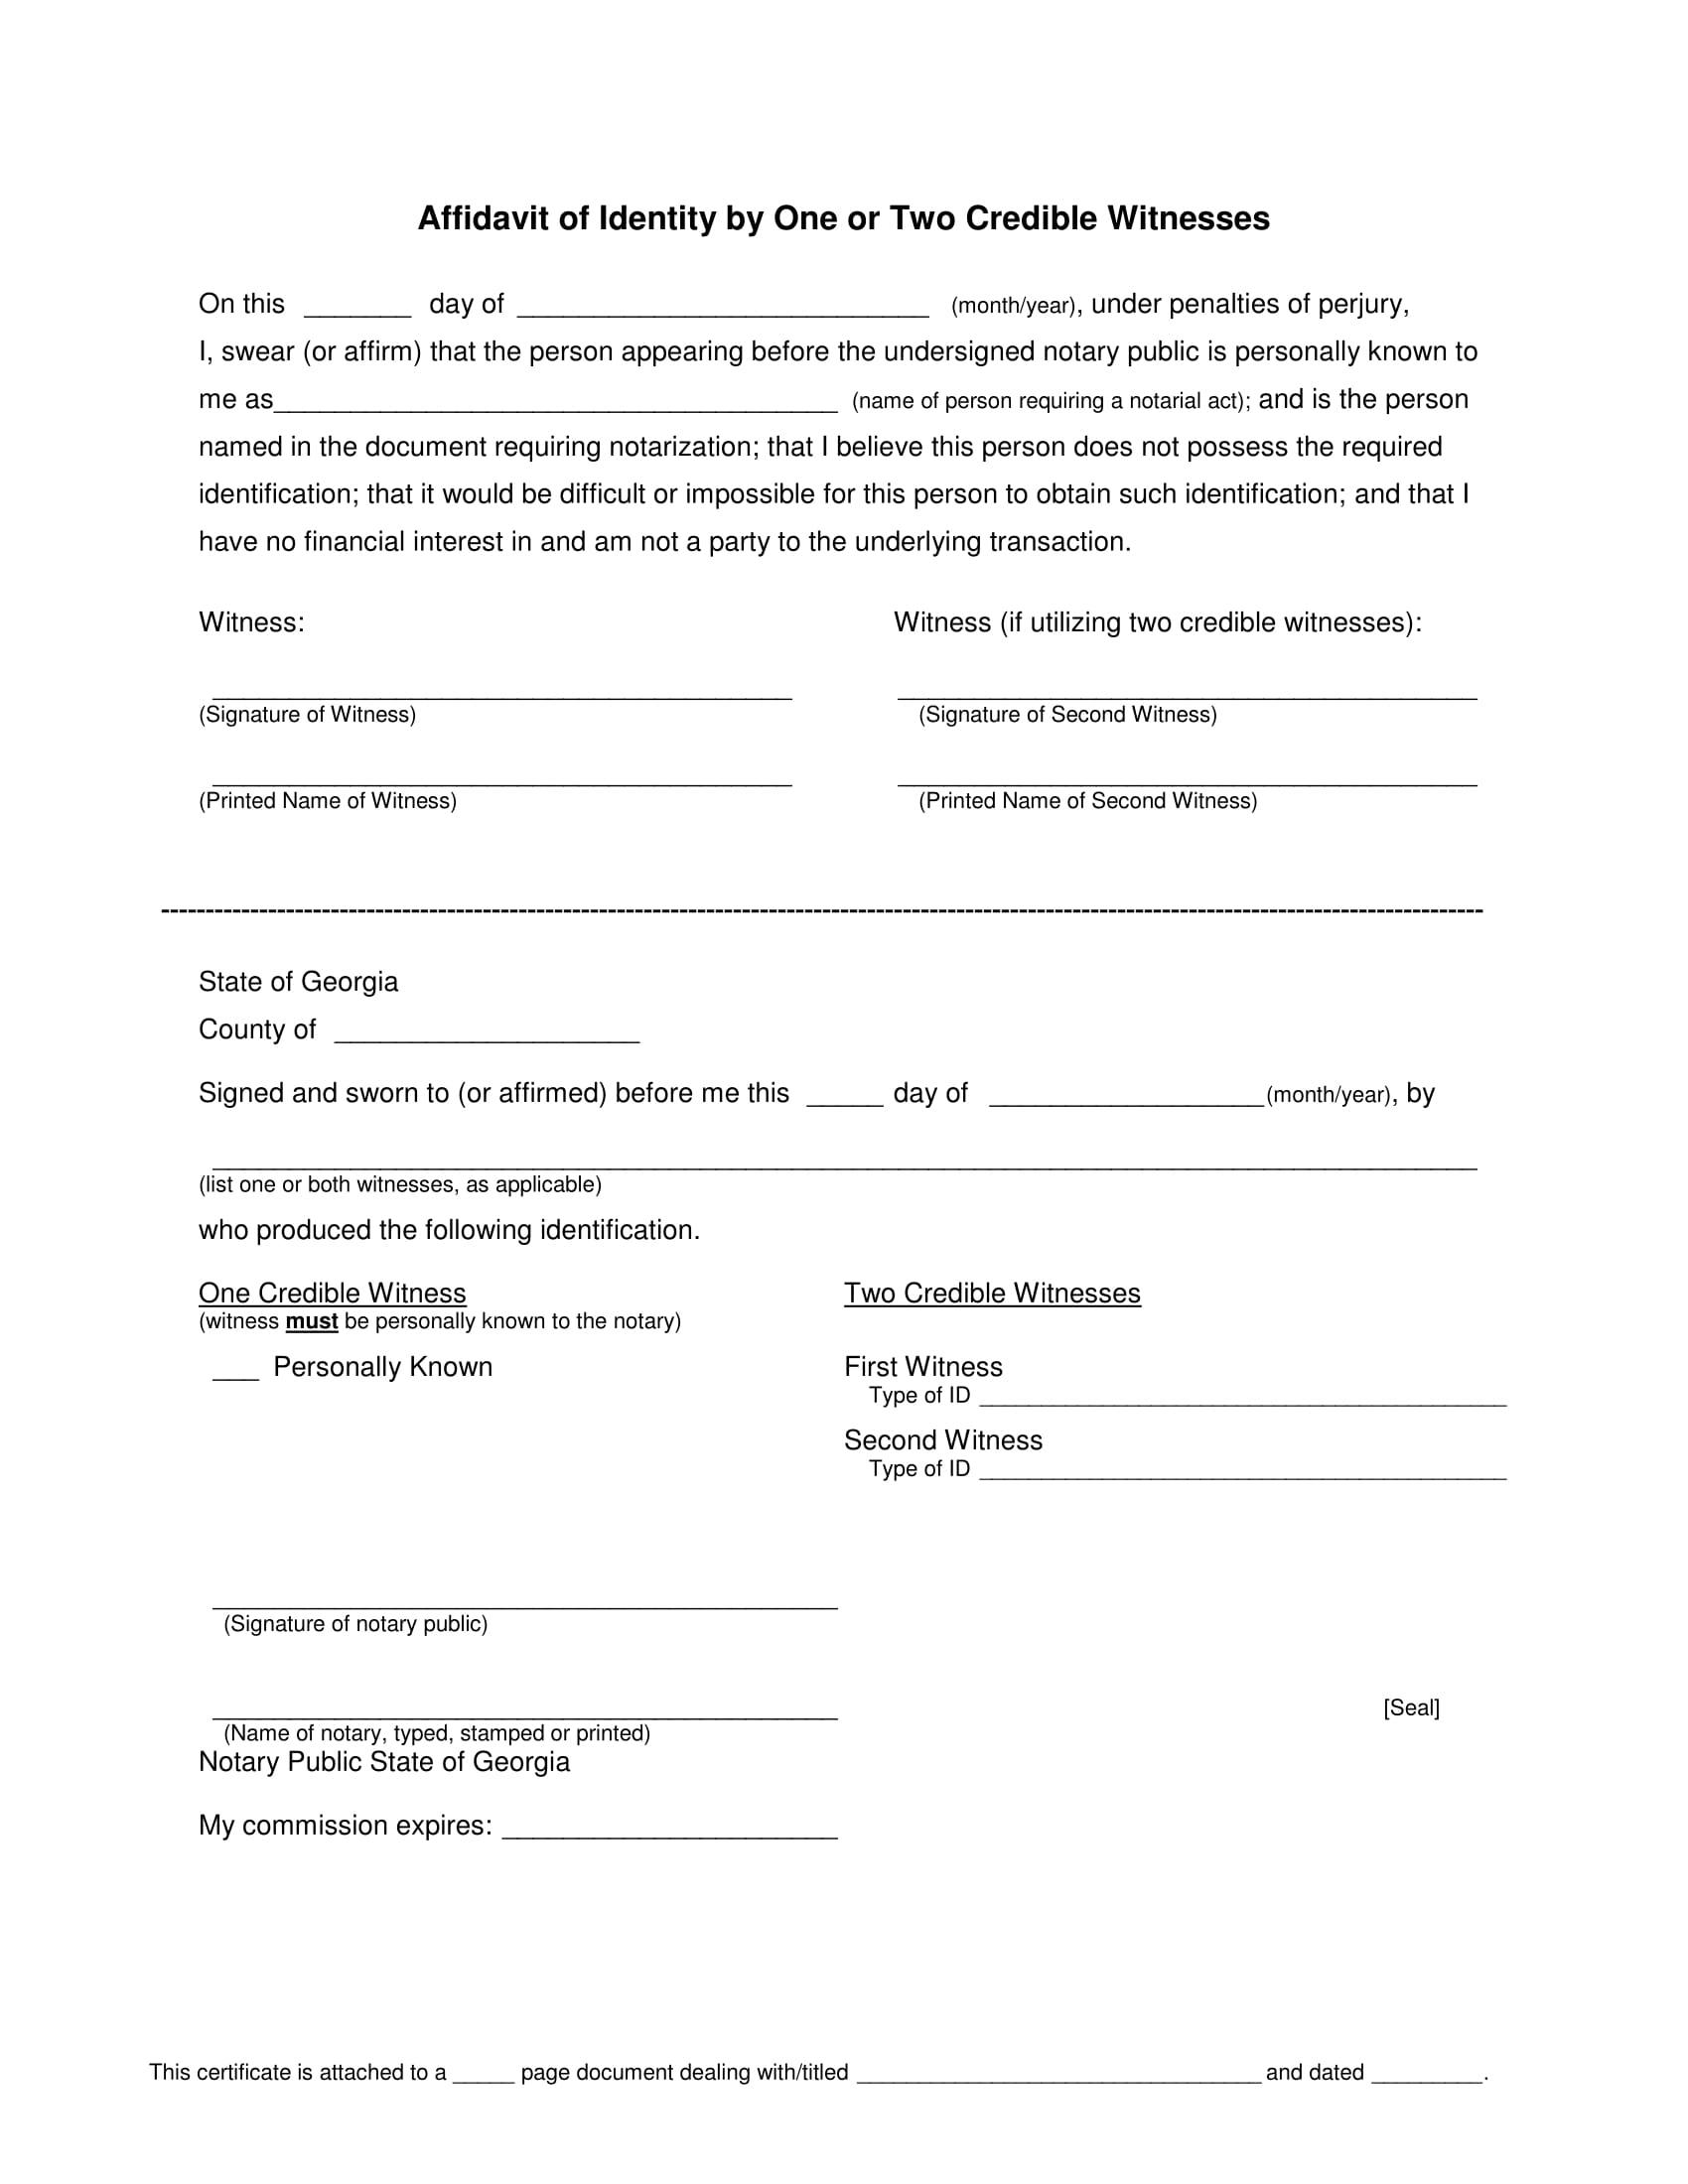 affidavit of witness identity format 1